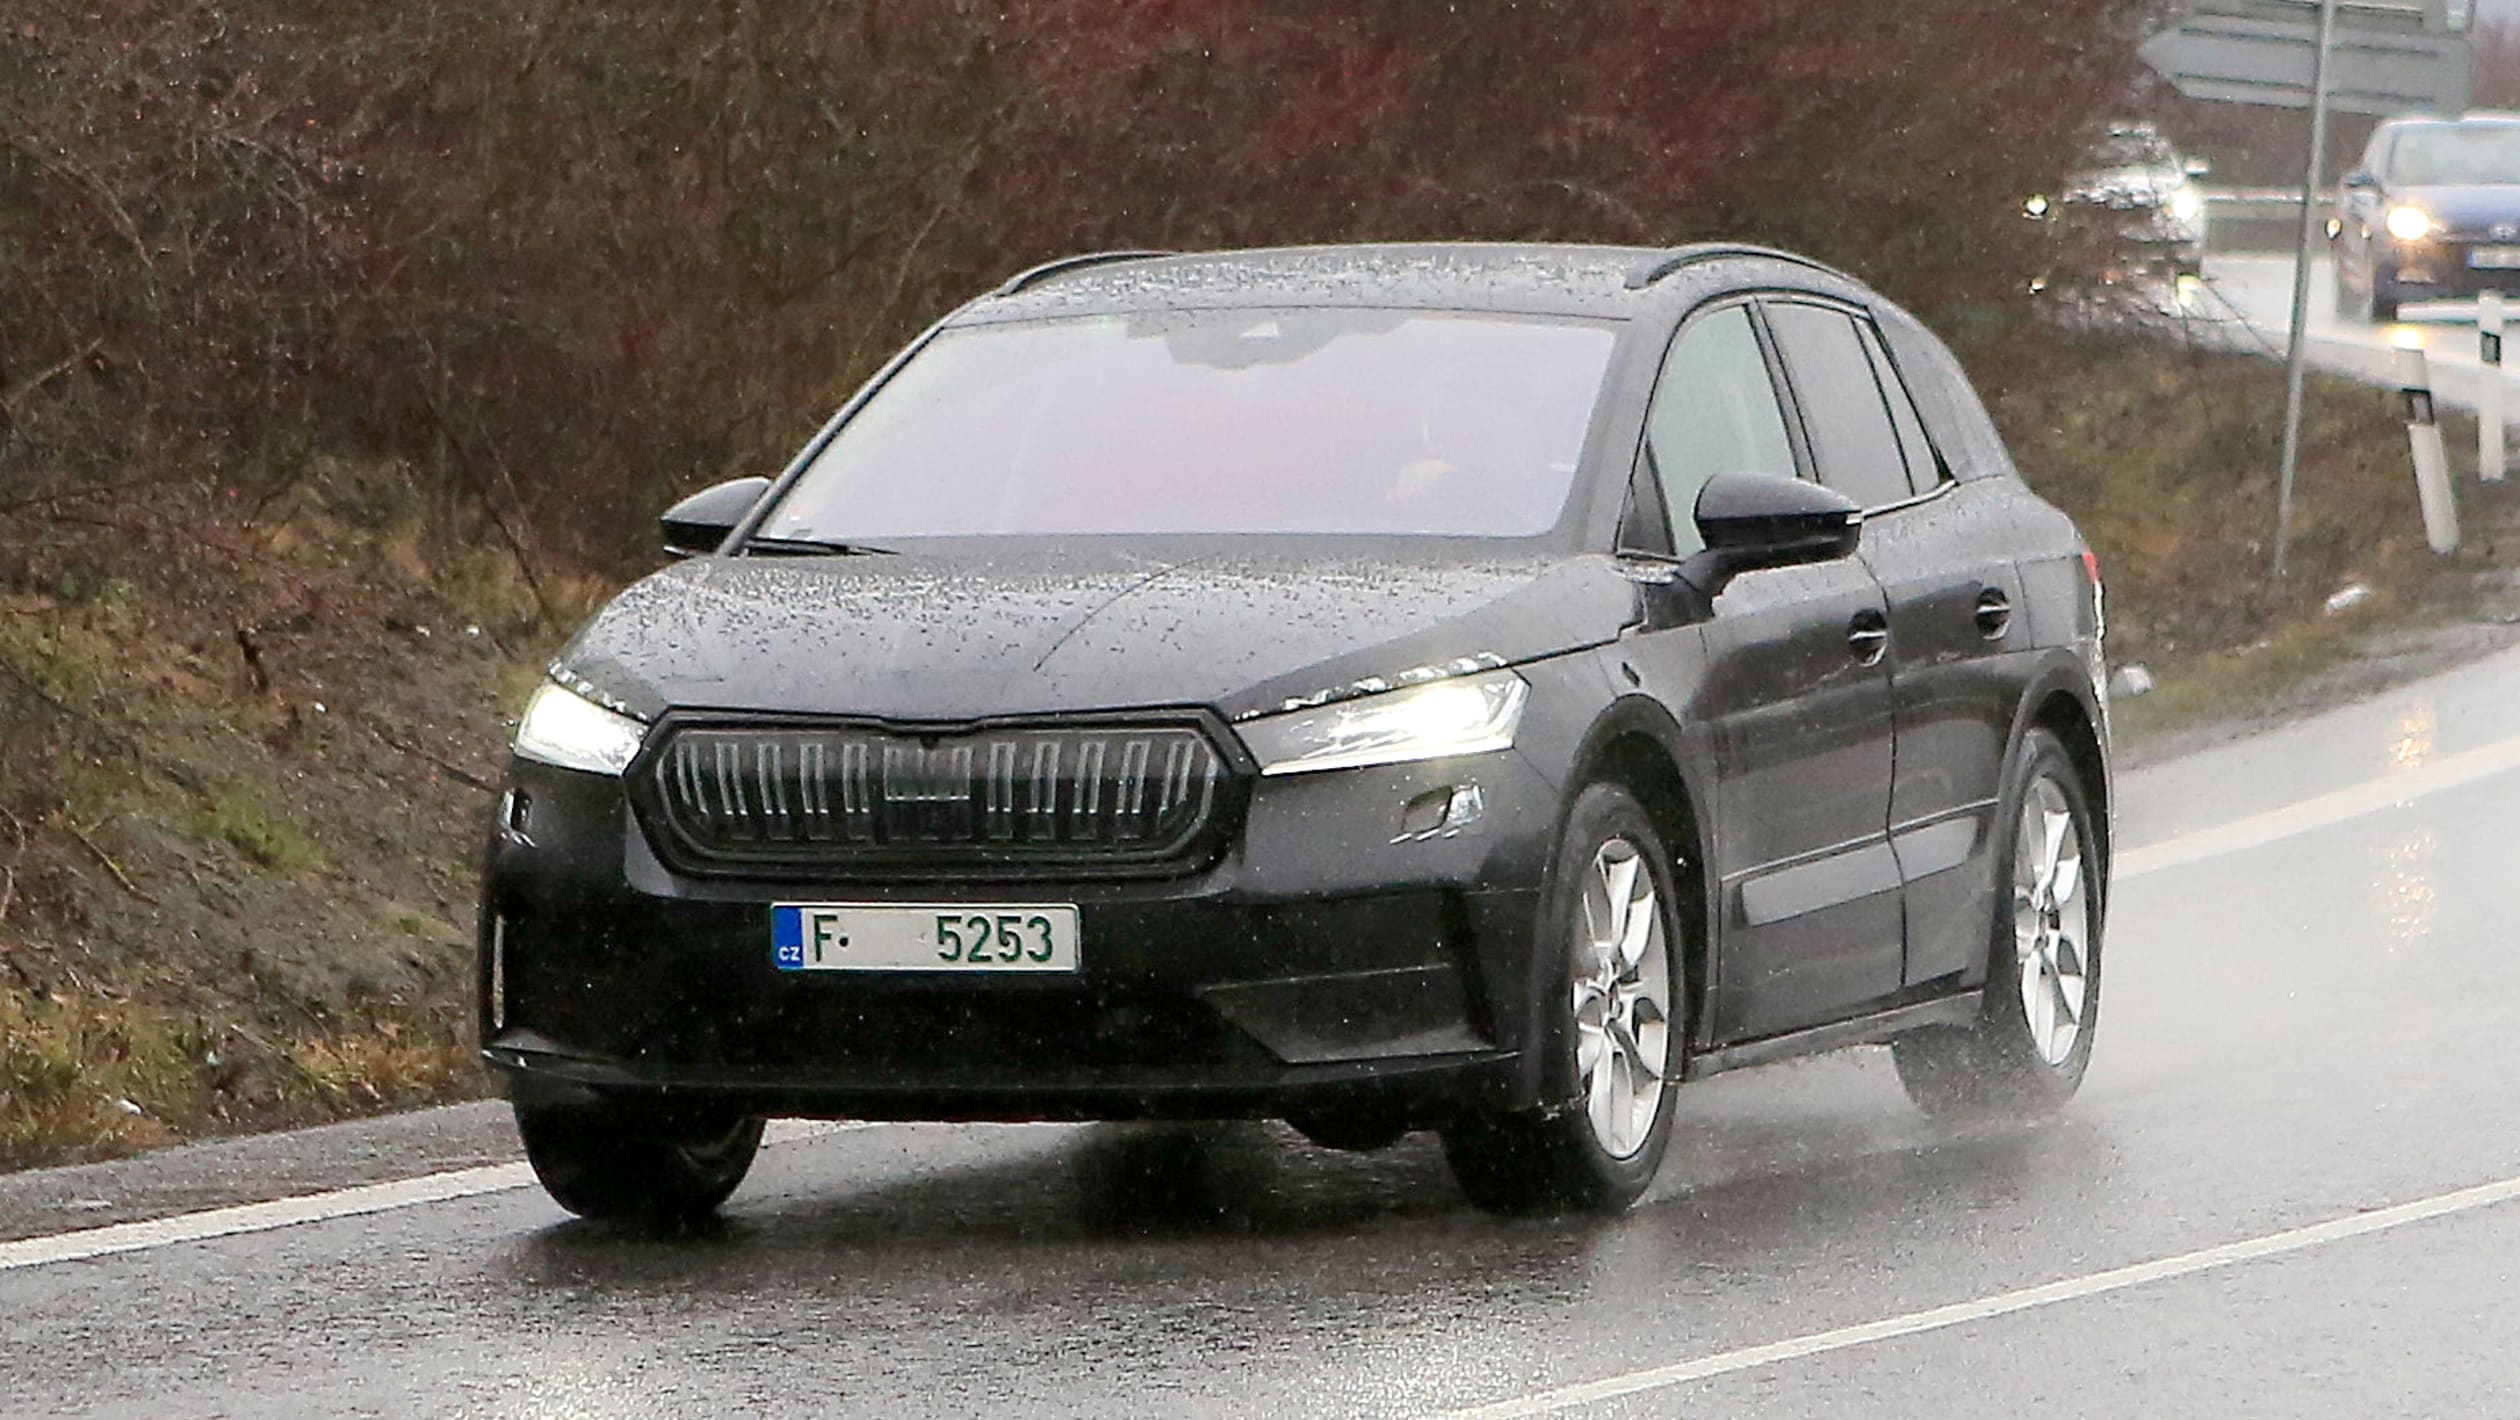 2021 - [Skoda] SUV EV - Page 3 2021%20Skoda%20Enyaq%20spied